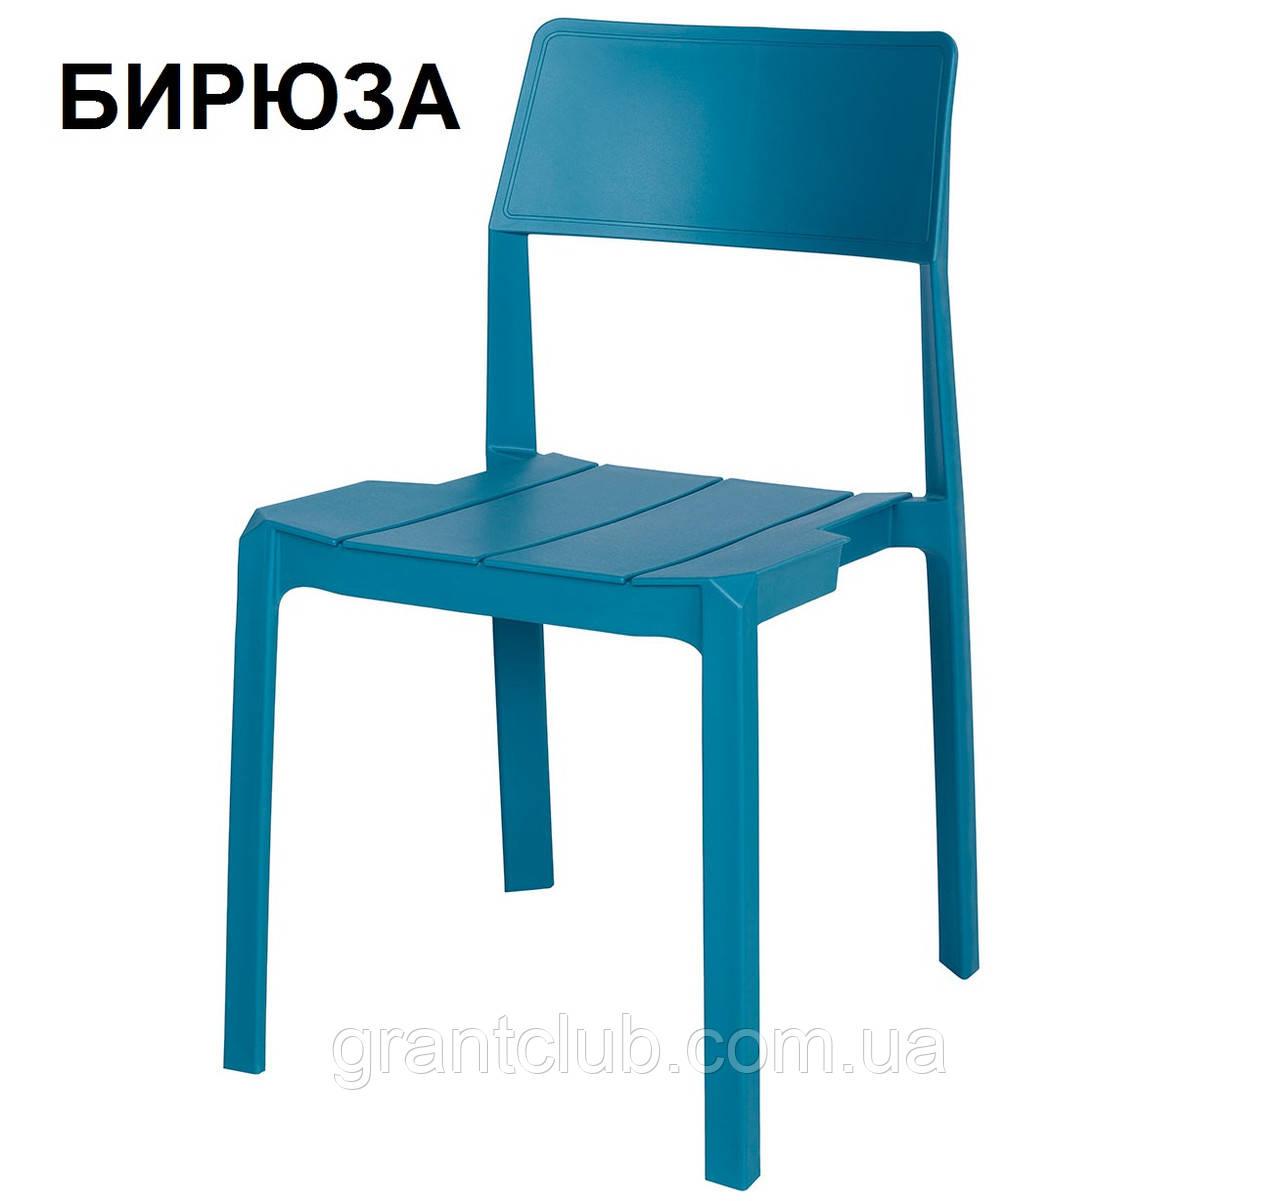 Cтул пластиковый ADONIC (Адоник) полипропилен бирюза Nicolas